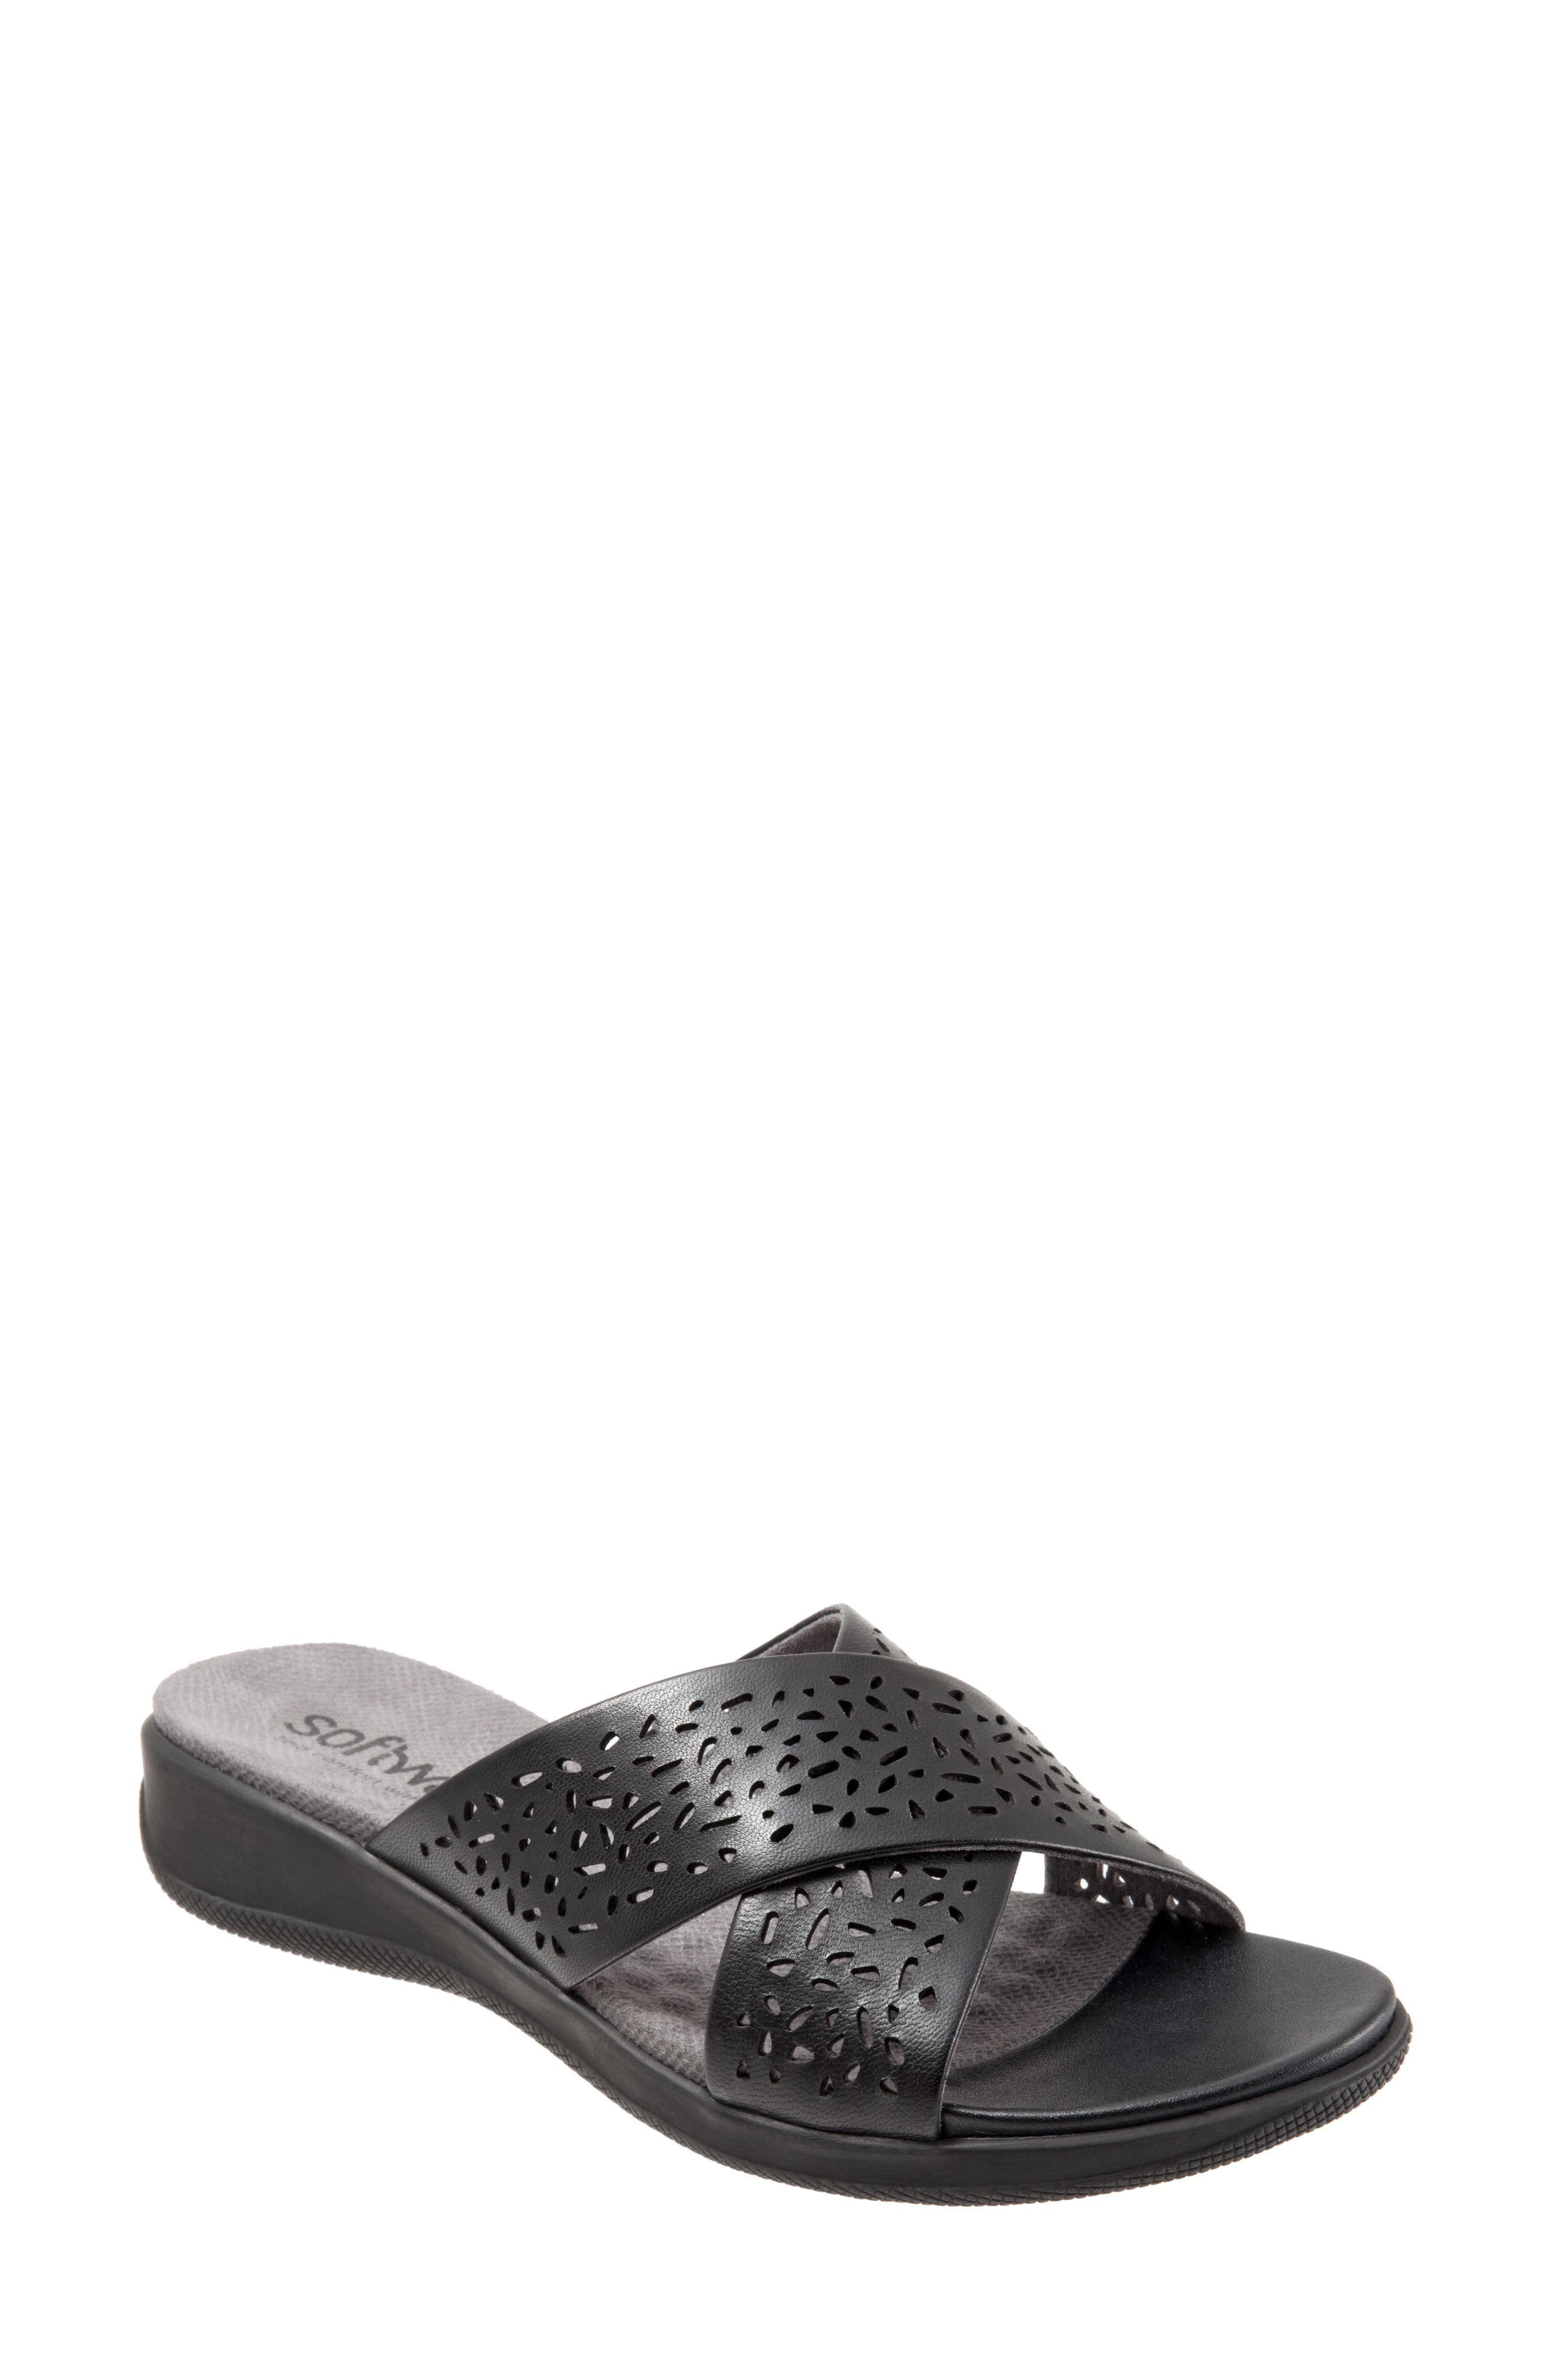 'Tillman' Leather Cross Strap Slide Sandal,                             Main thumbnail 1, color,                             006